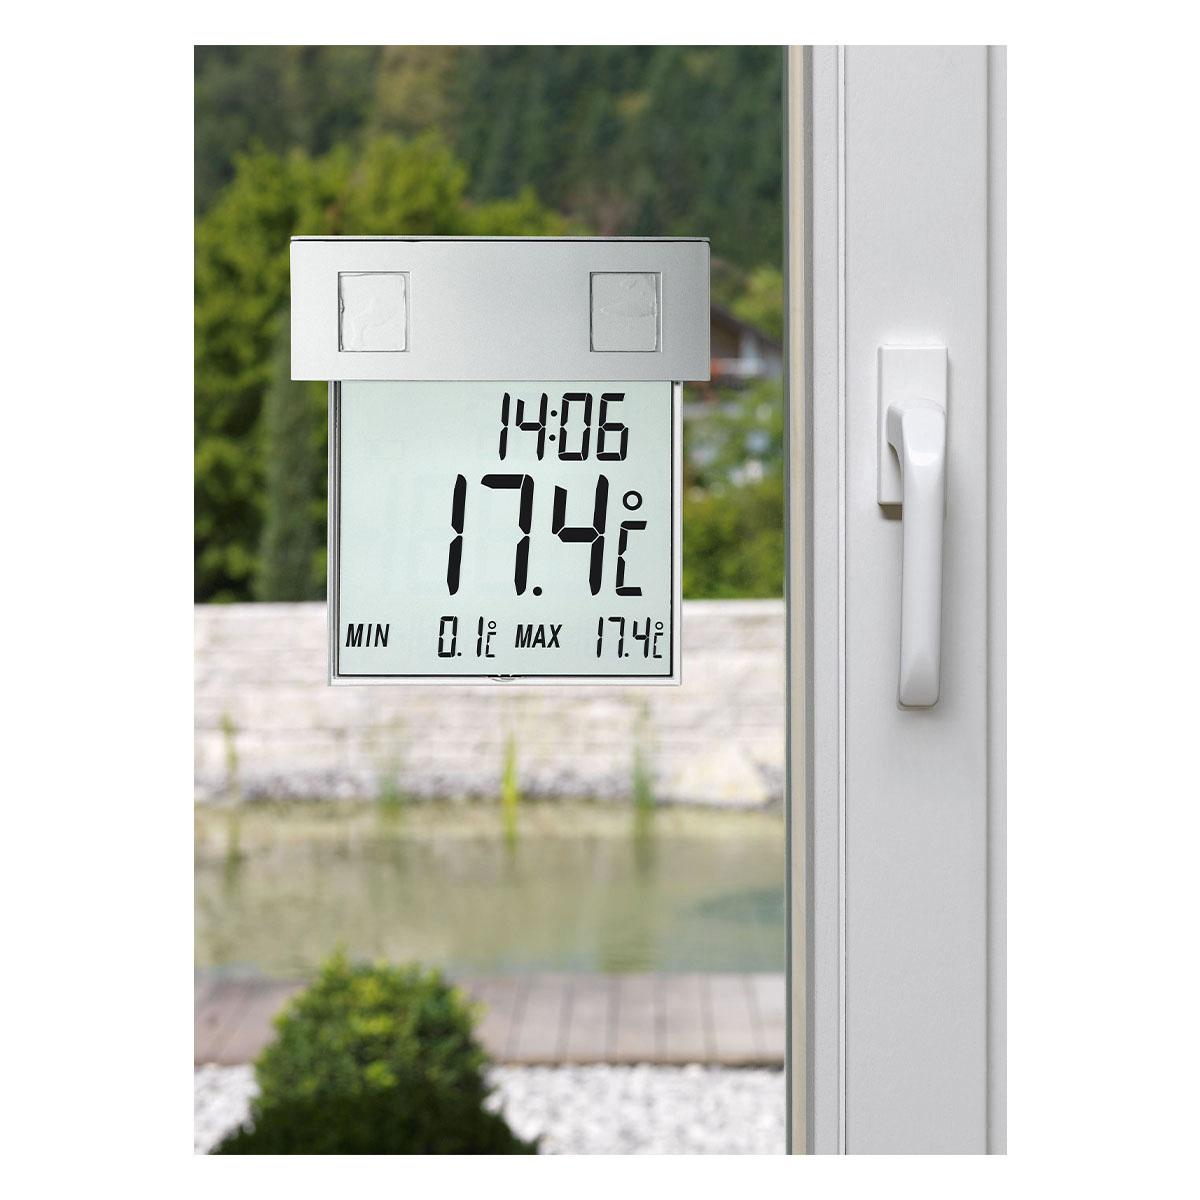 30-1035-digitales-fensterthermometer-mit-solarbeleuchtung-vision-solar-anwendung1-1200x1200px.jpg